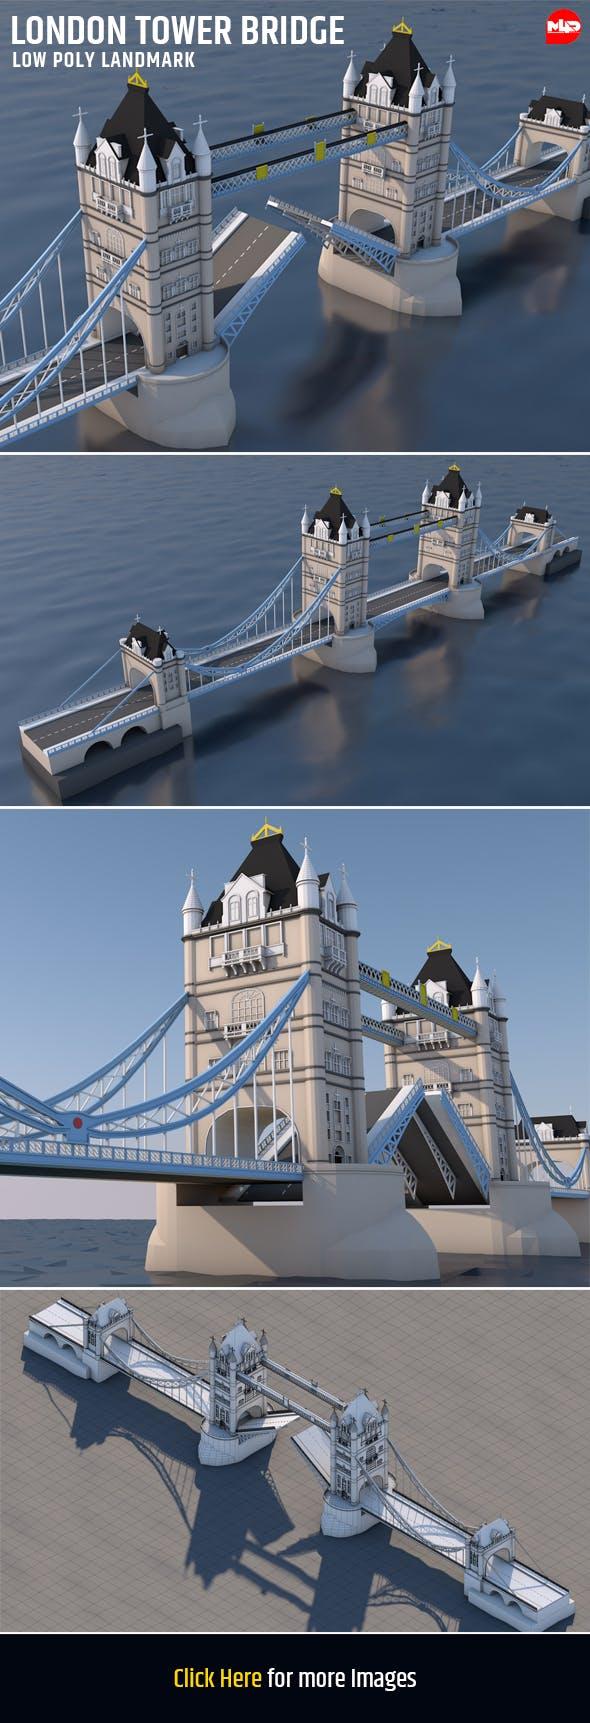 Low Poly London Tower Bridge Landmark - 3DOcean Item for Sale